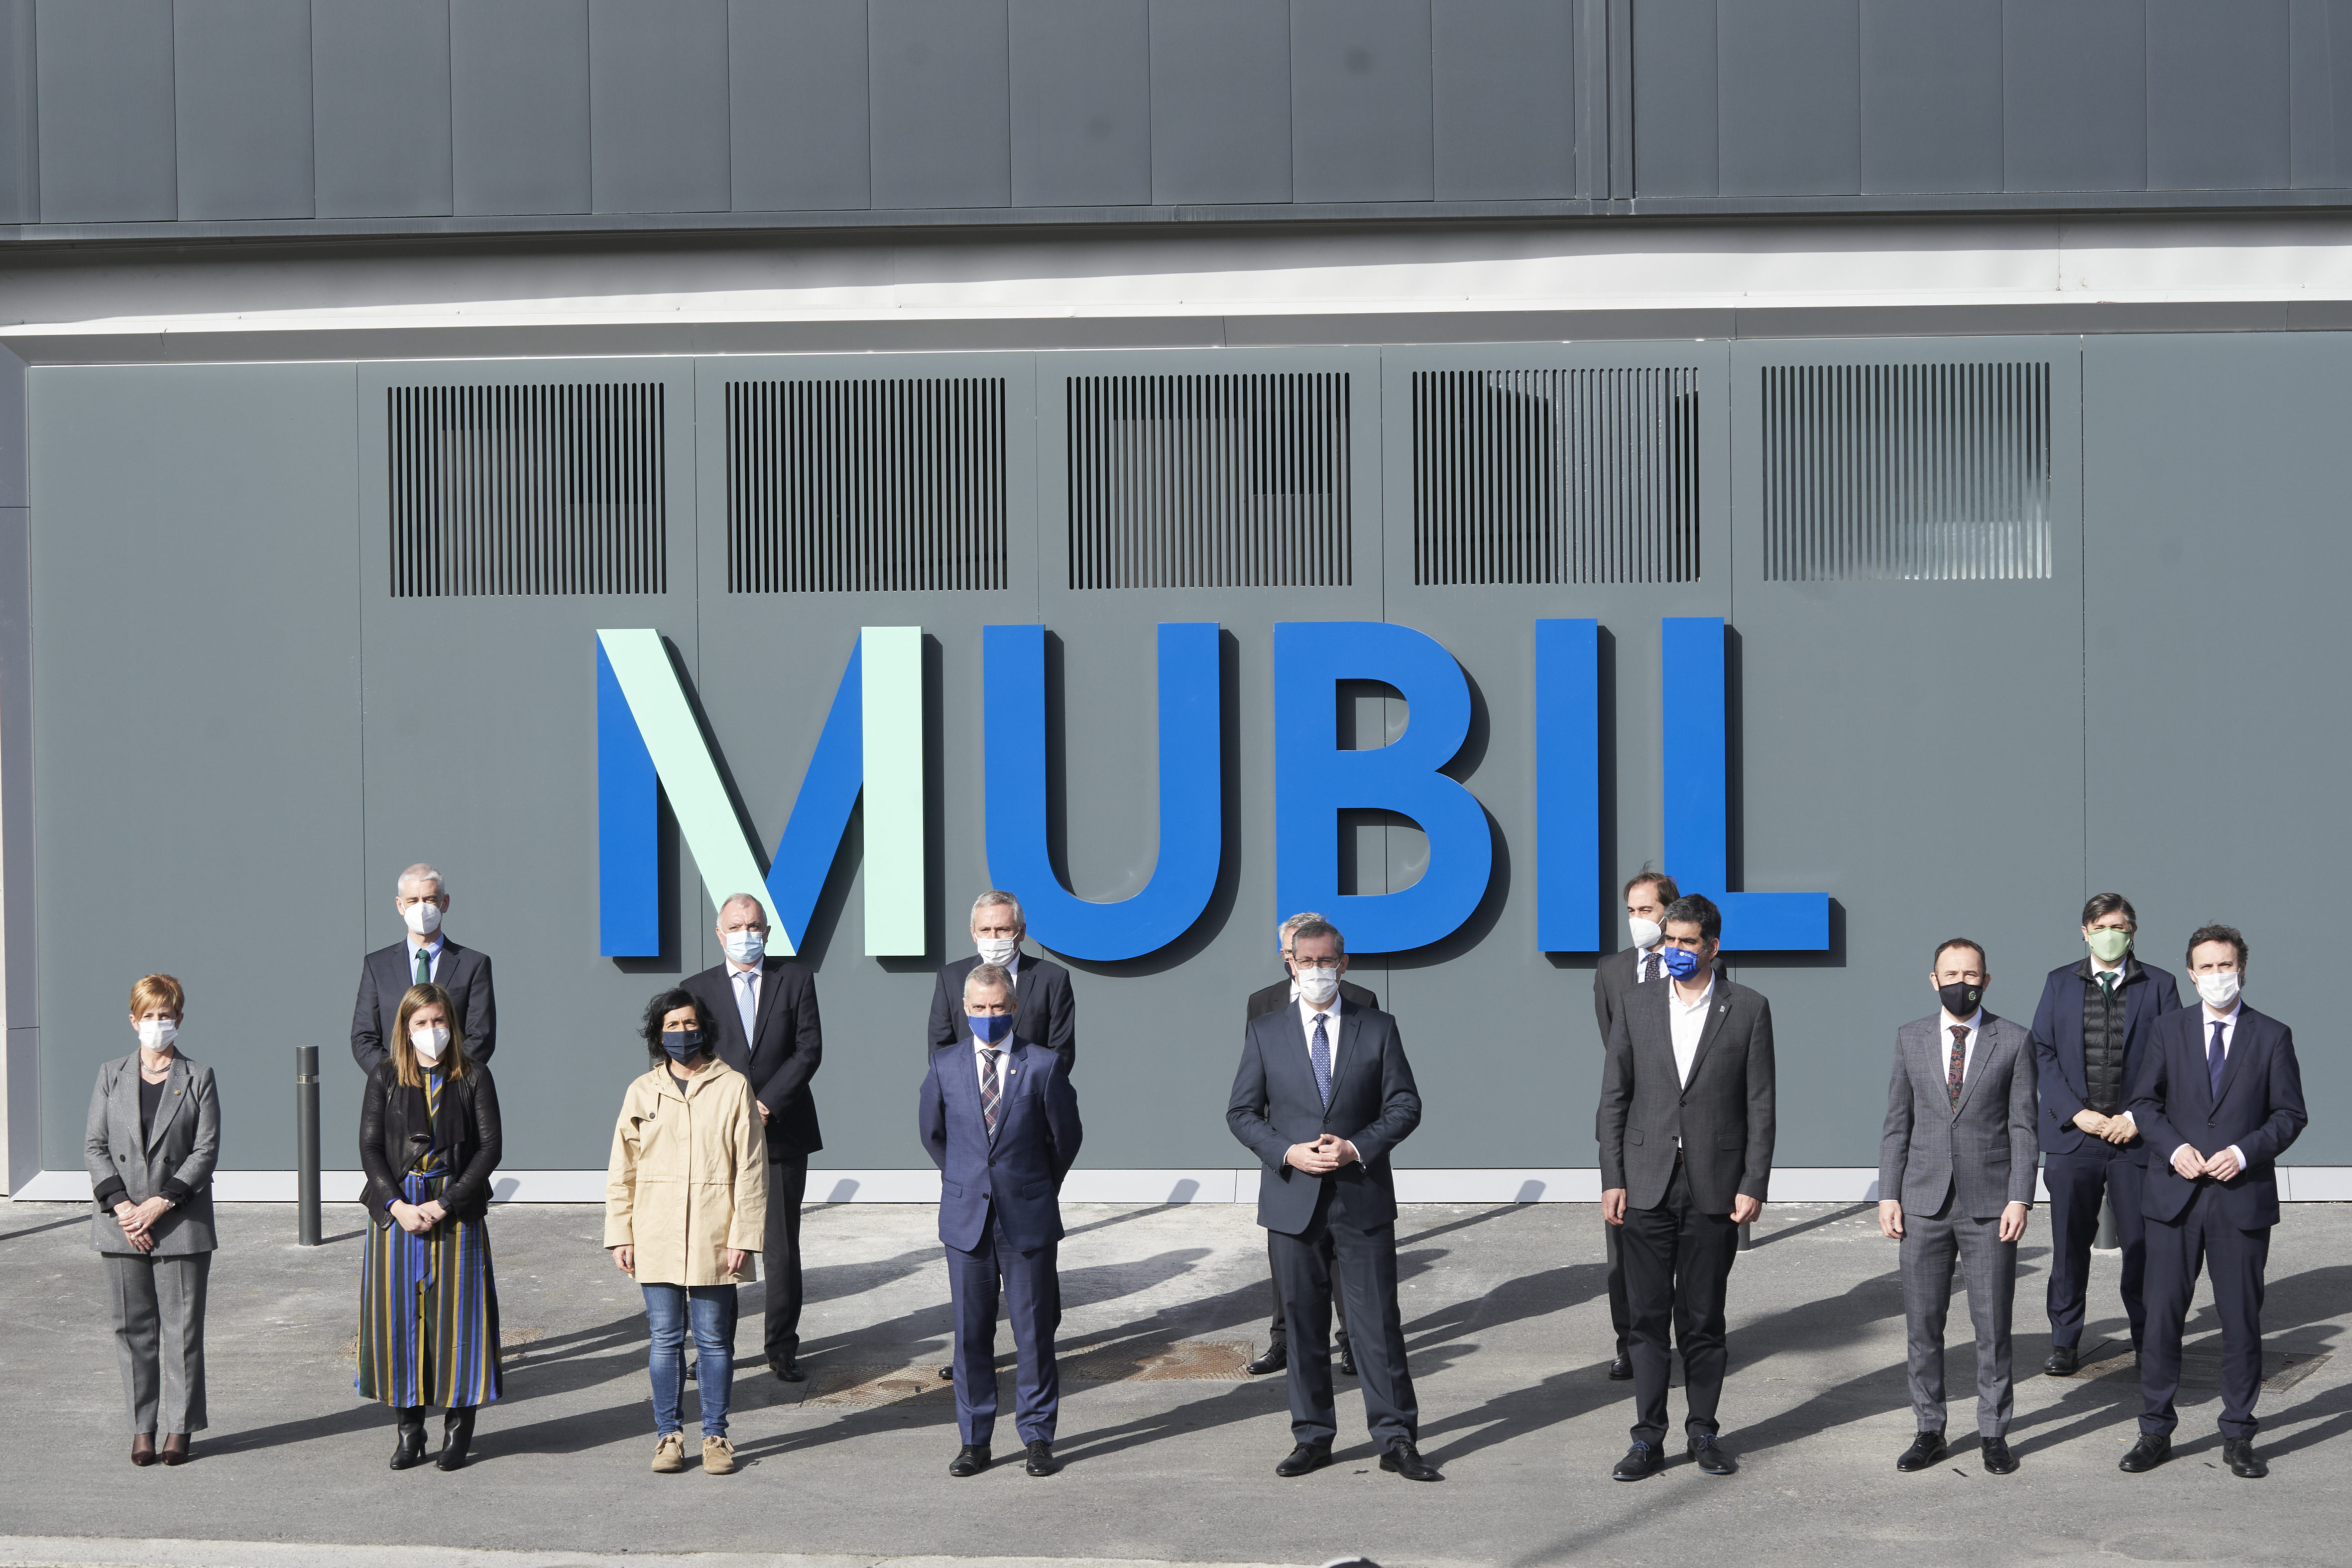 El Lehendakari asiste a la apertura del Centro de Electromovilidad MUBIL [8:10]